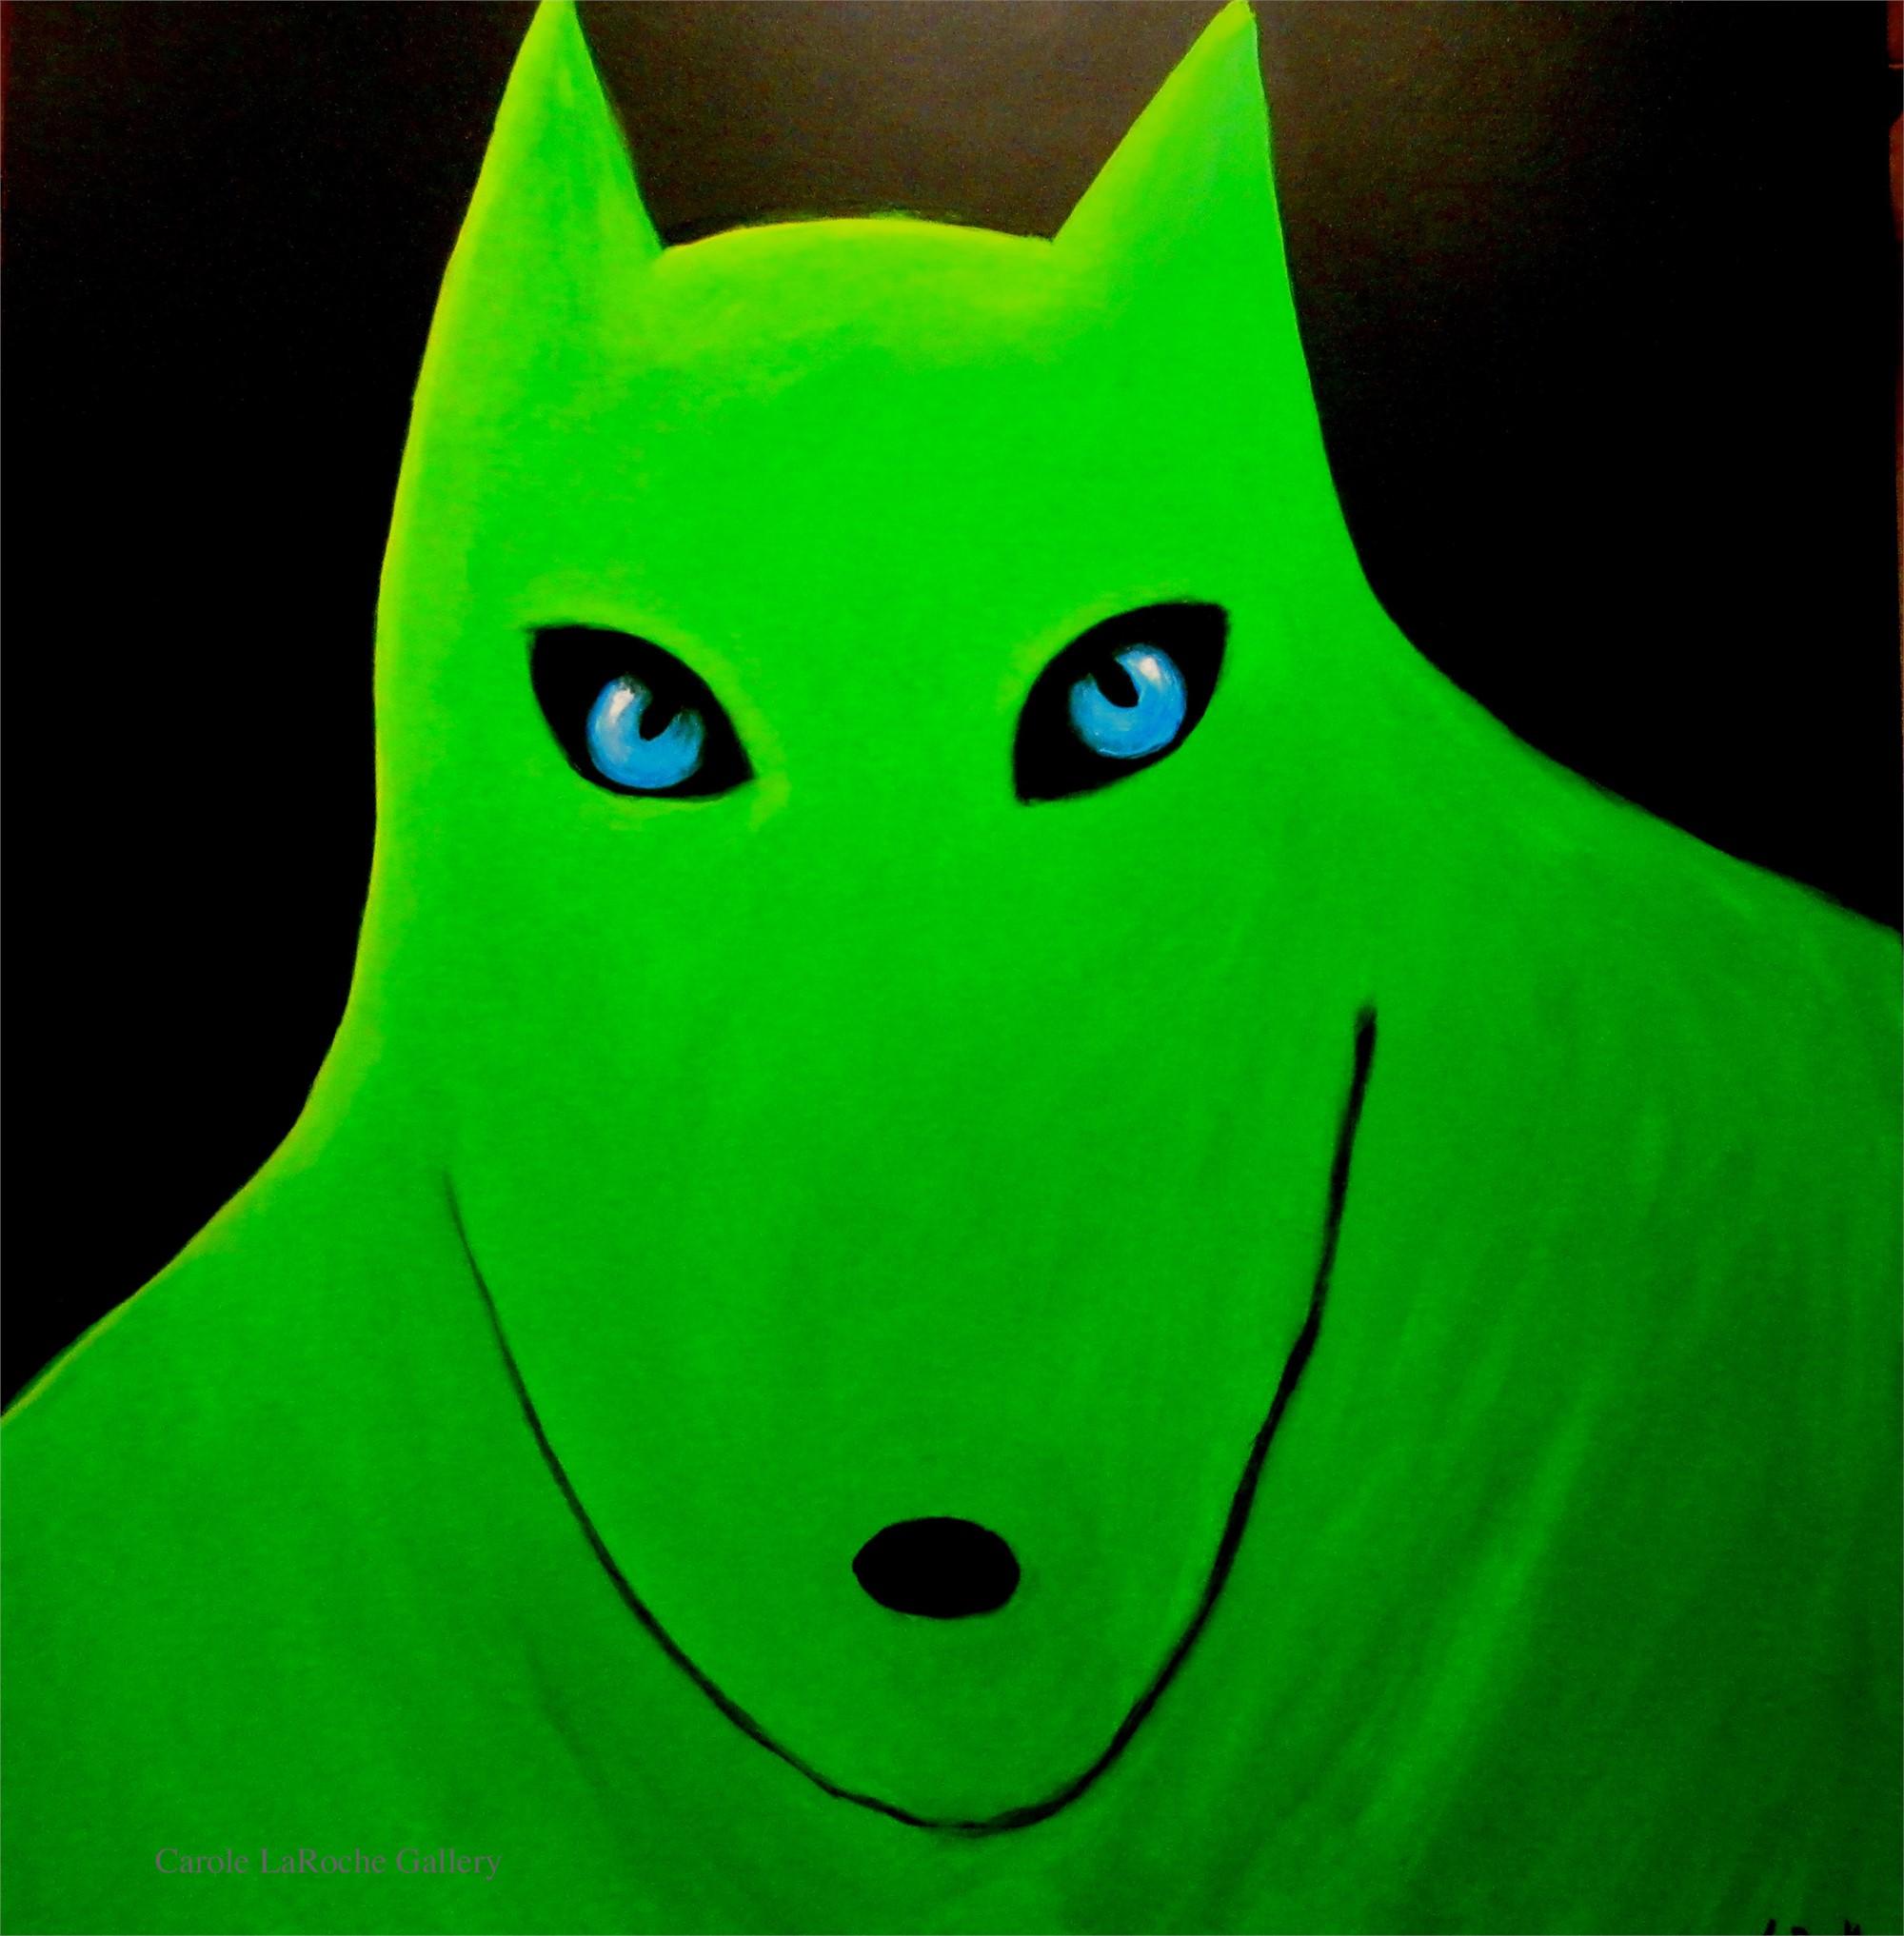 WILD GREEN WOLF by Carole LaRoche